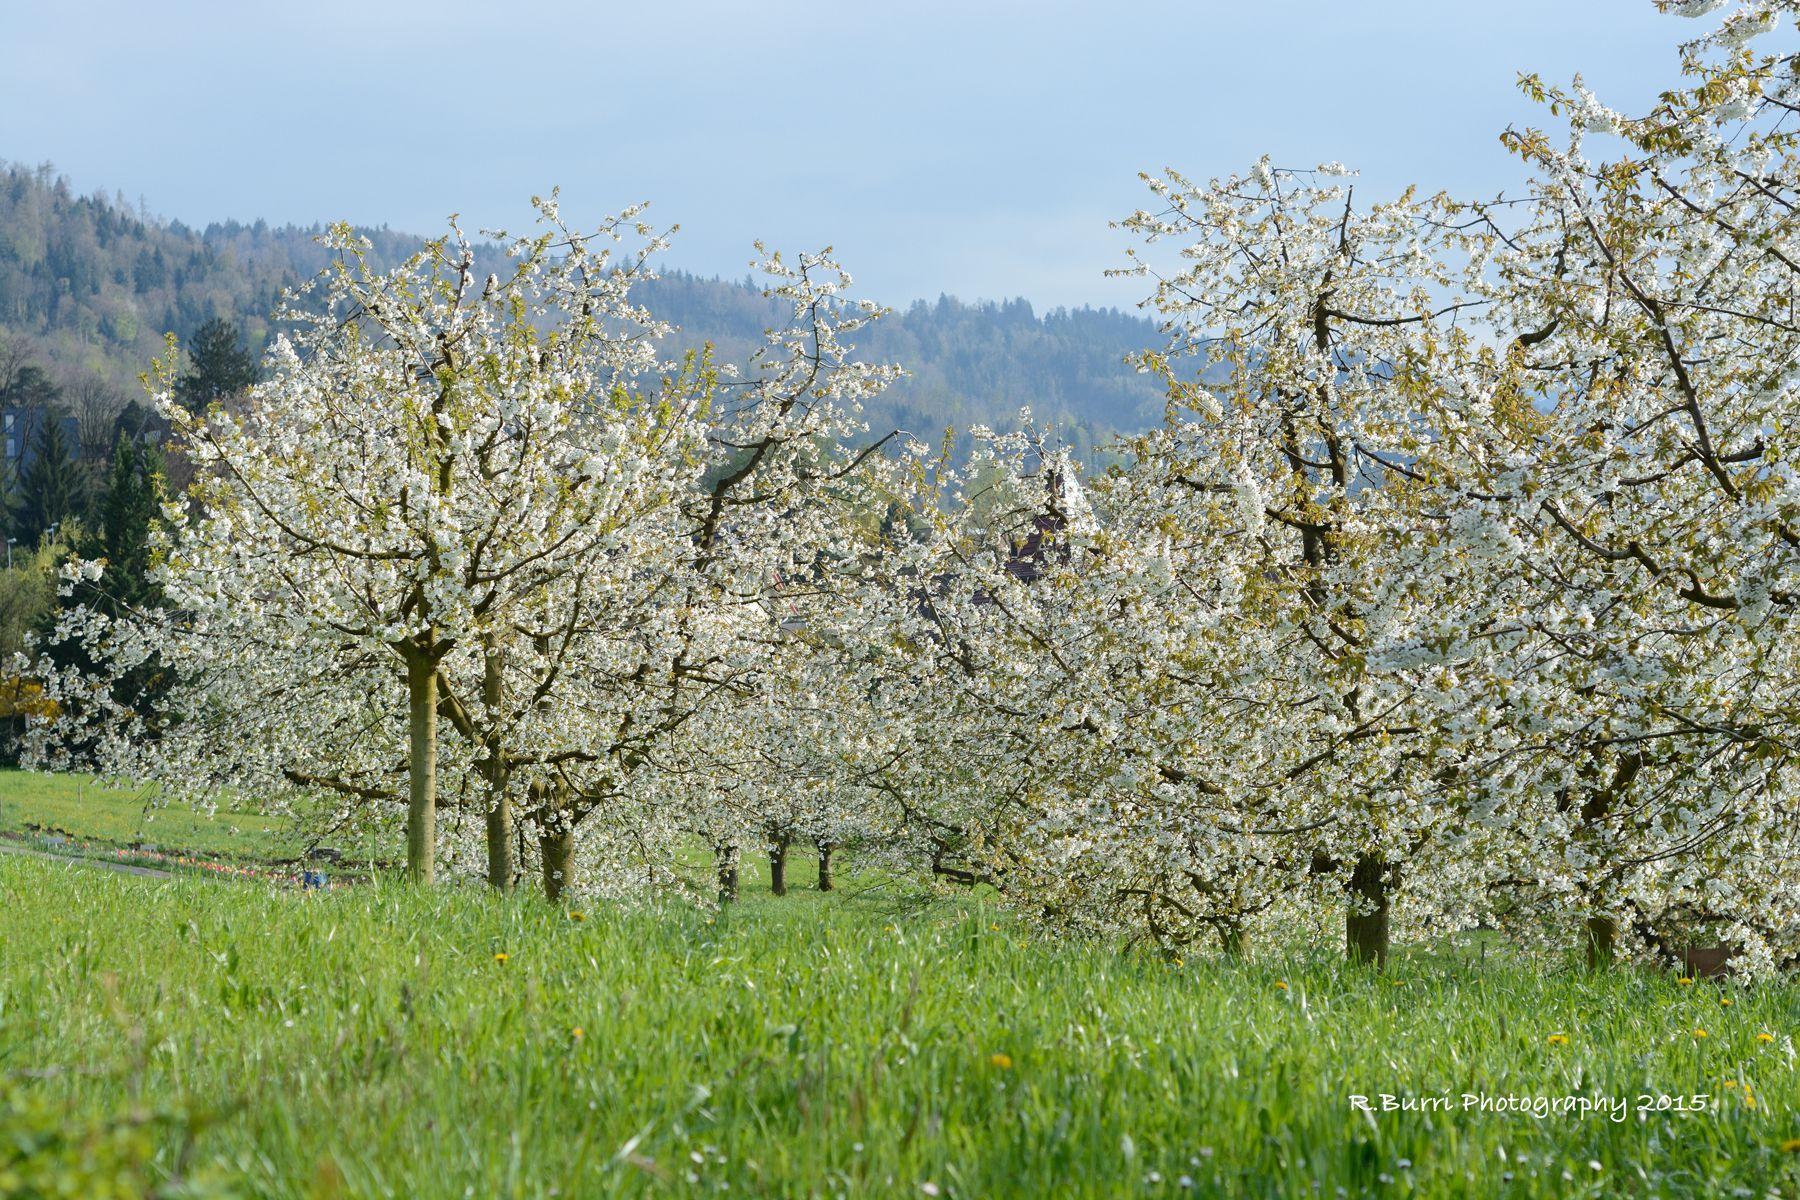 Blooming Cherry Trees in Zug, Switzerland